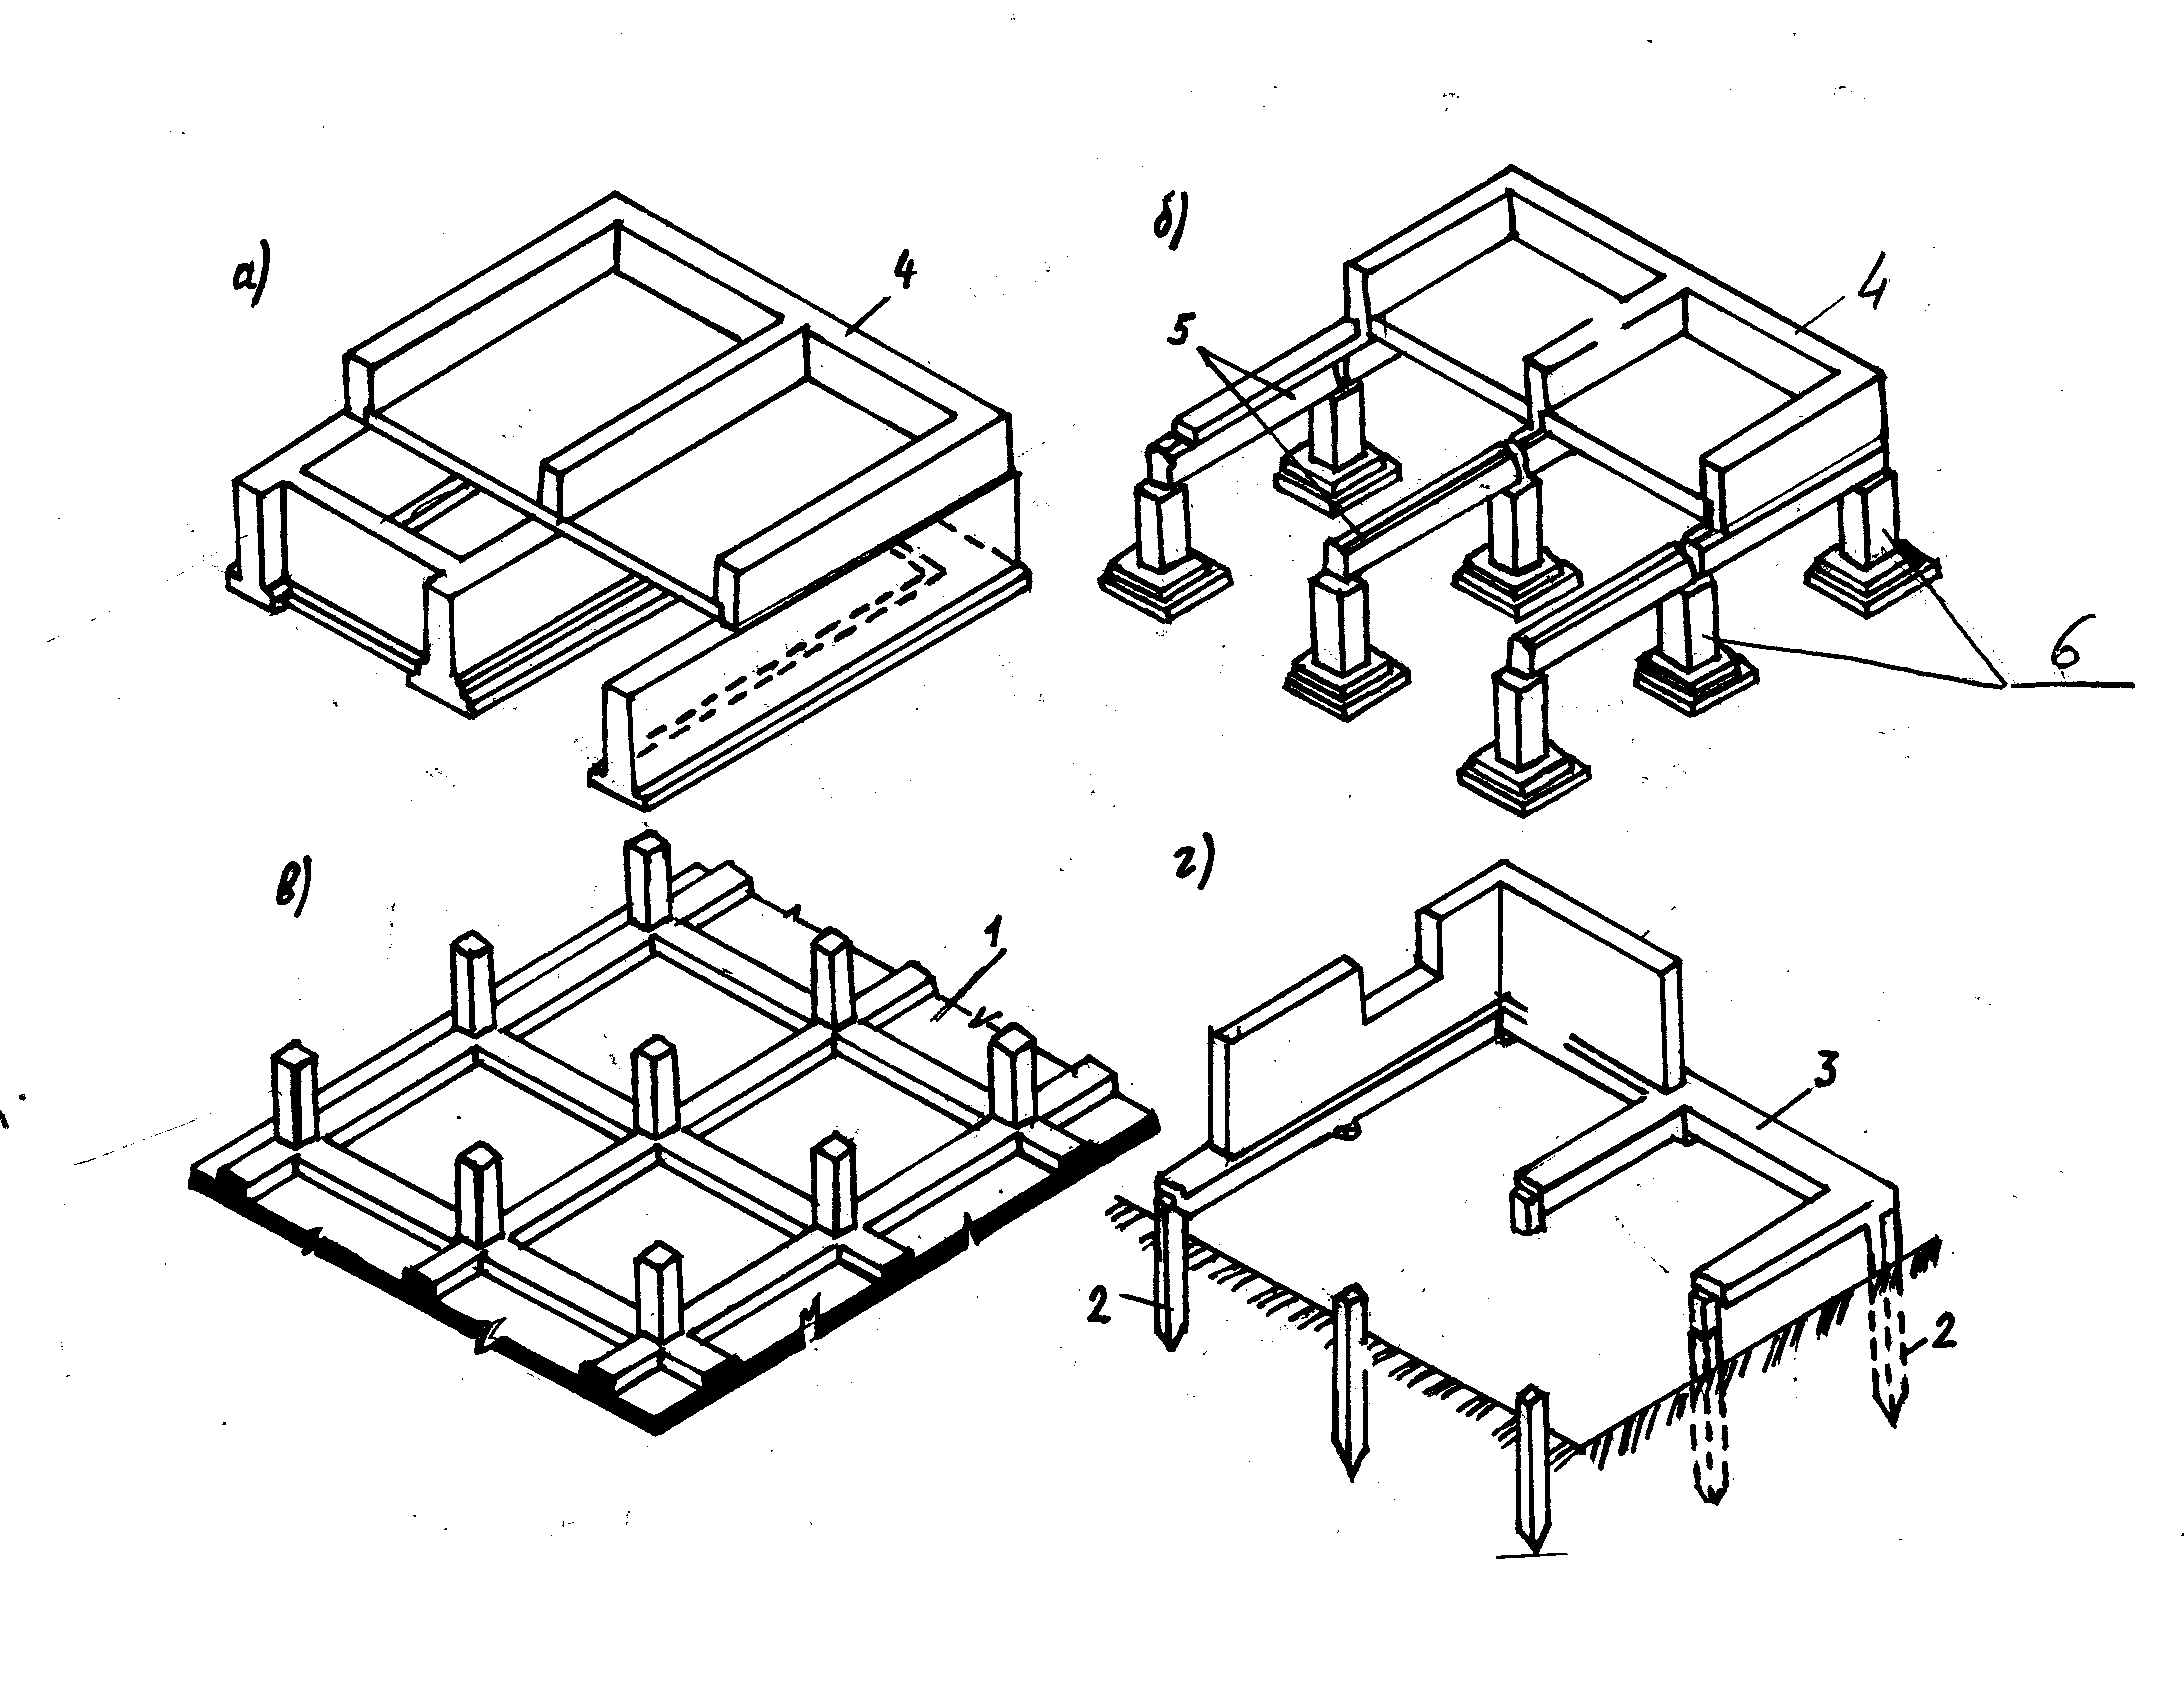 Монолитный железобетонный фундамент под колонны